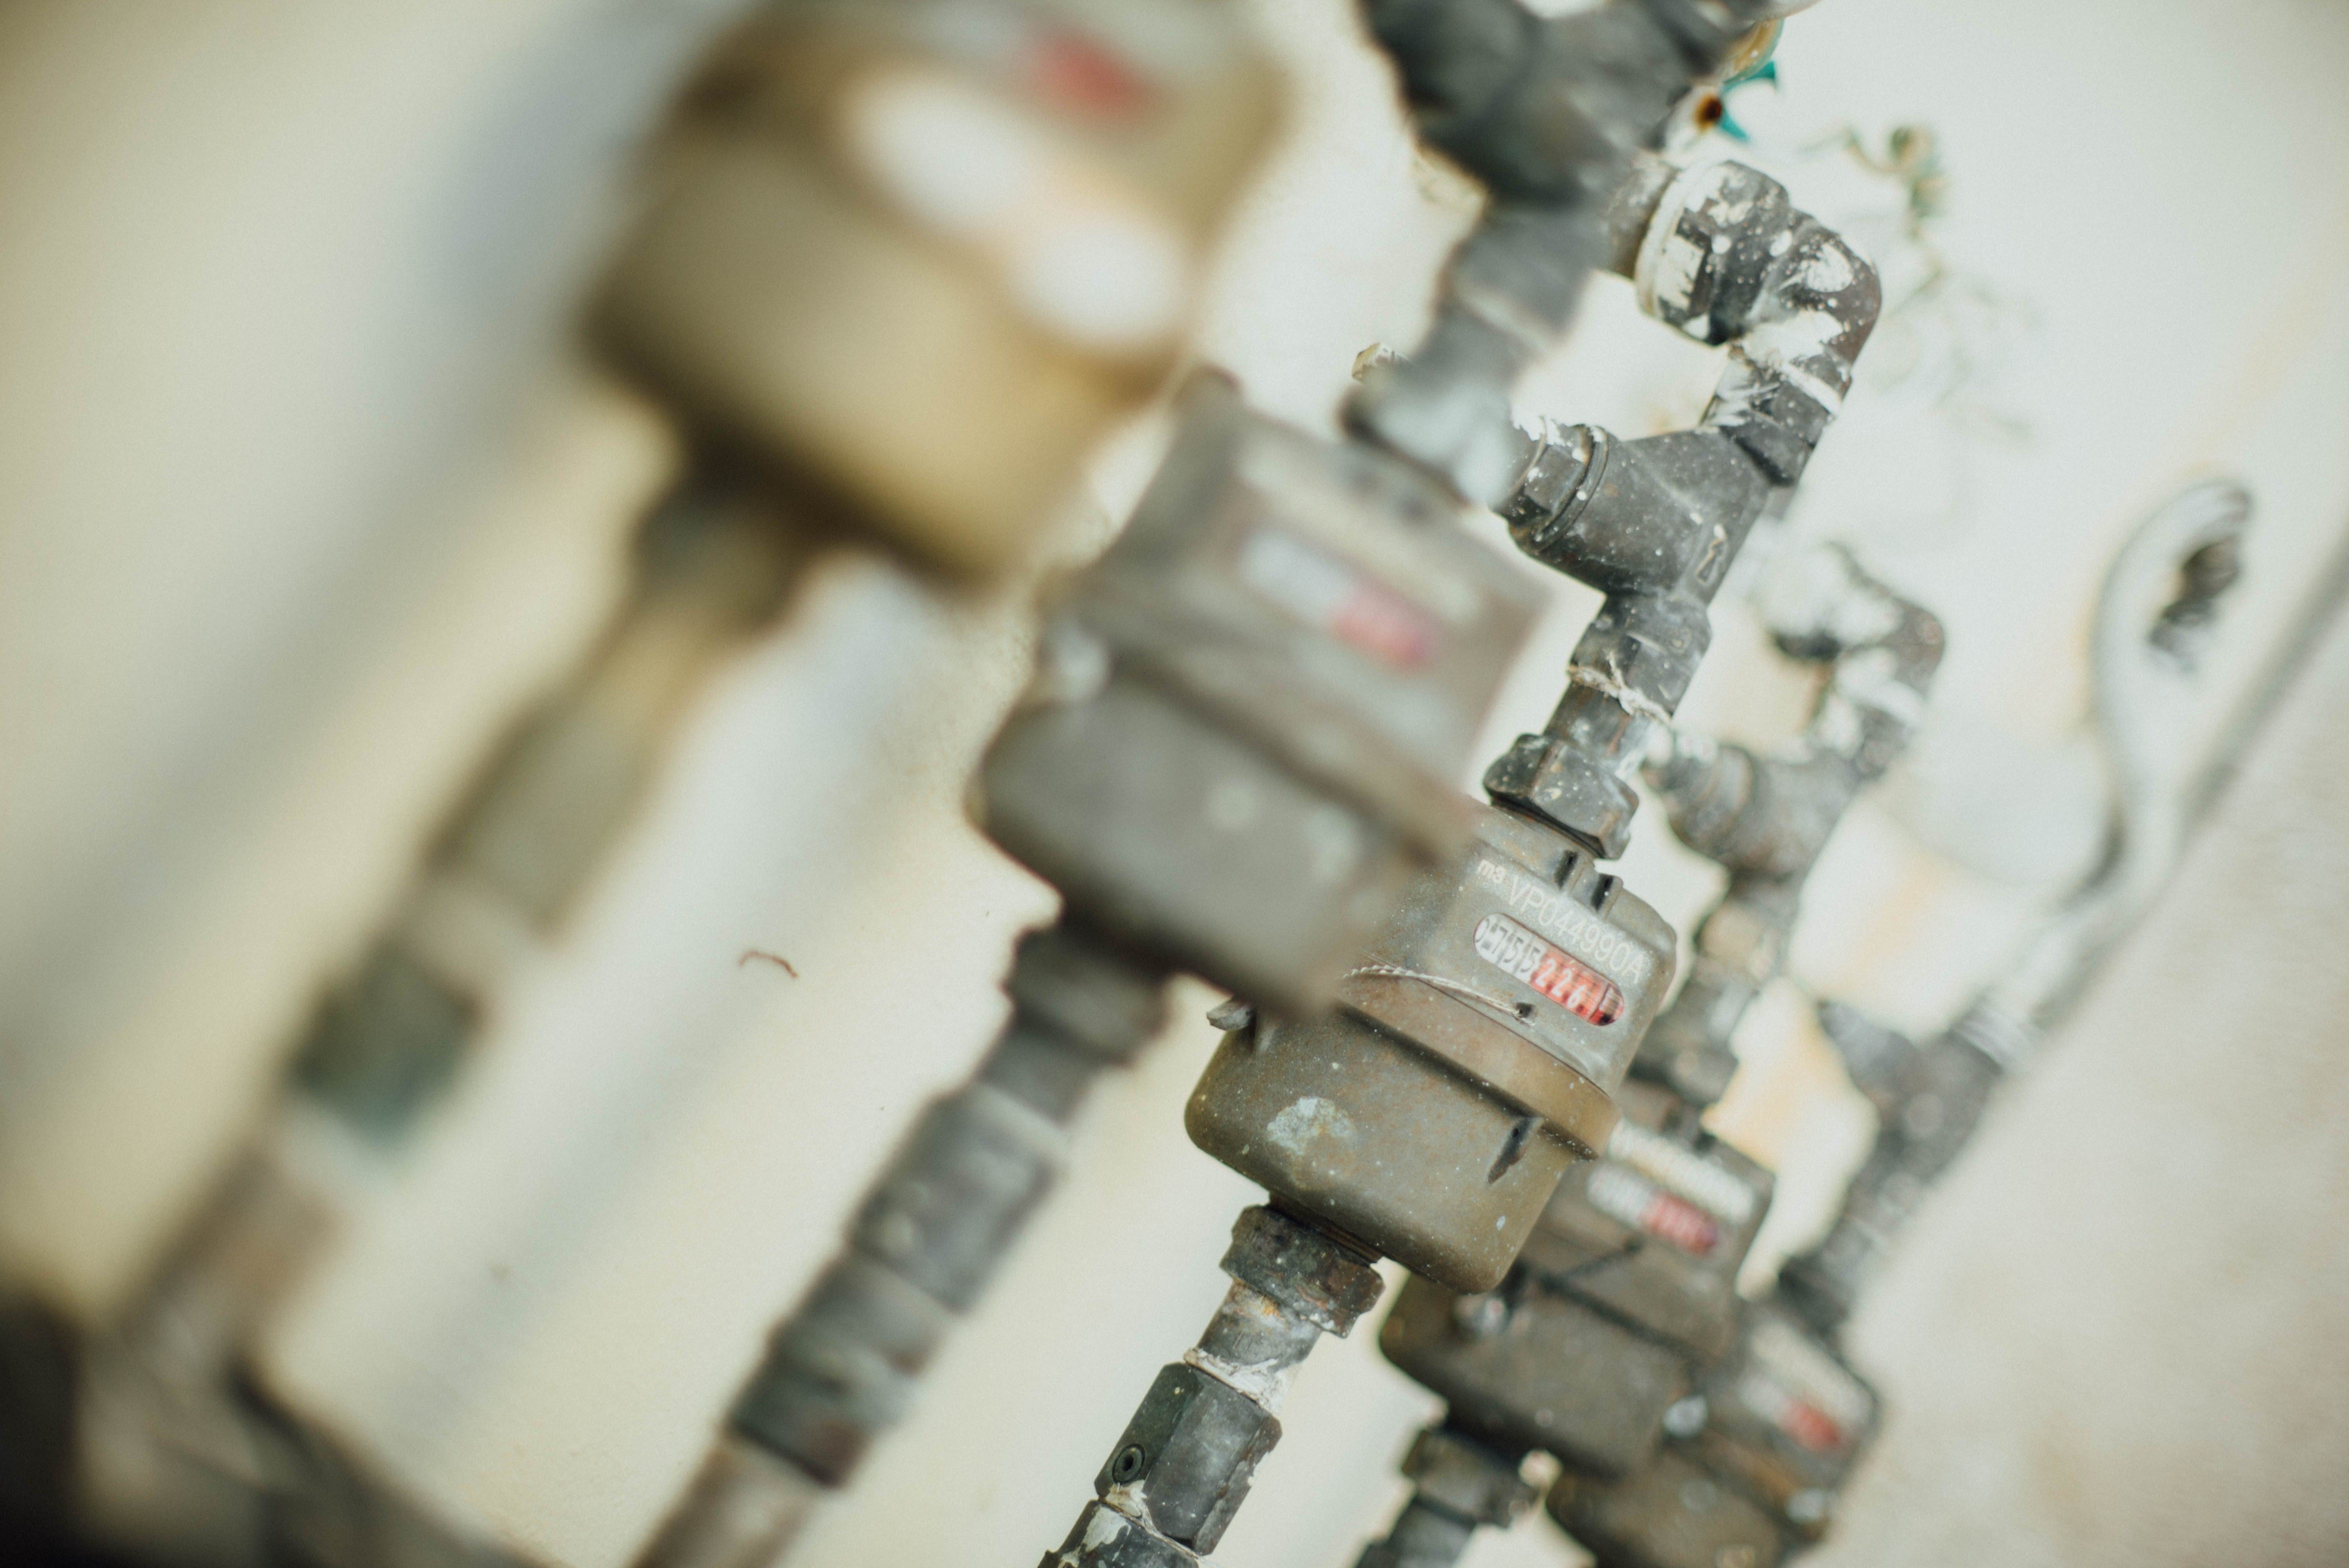 Maintenance Plumbing Post To Spare You A Few Dilemmas